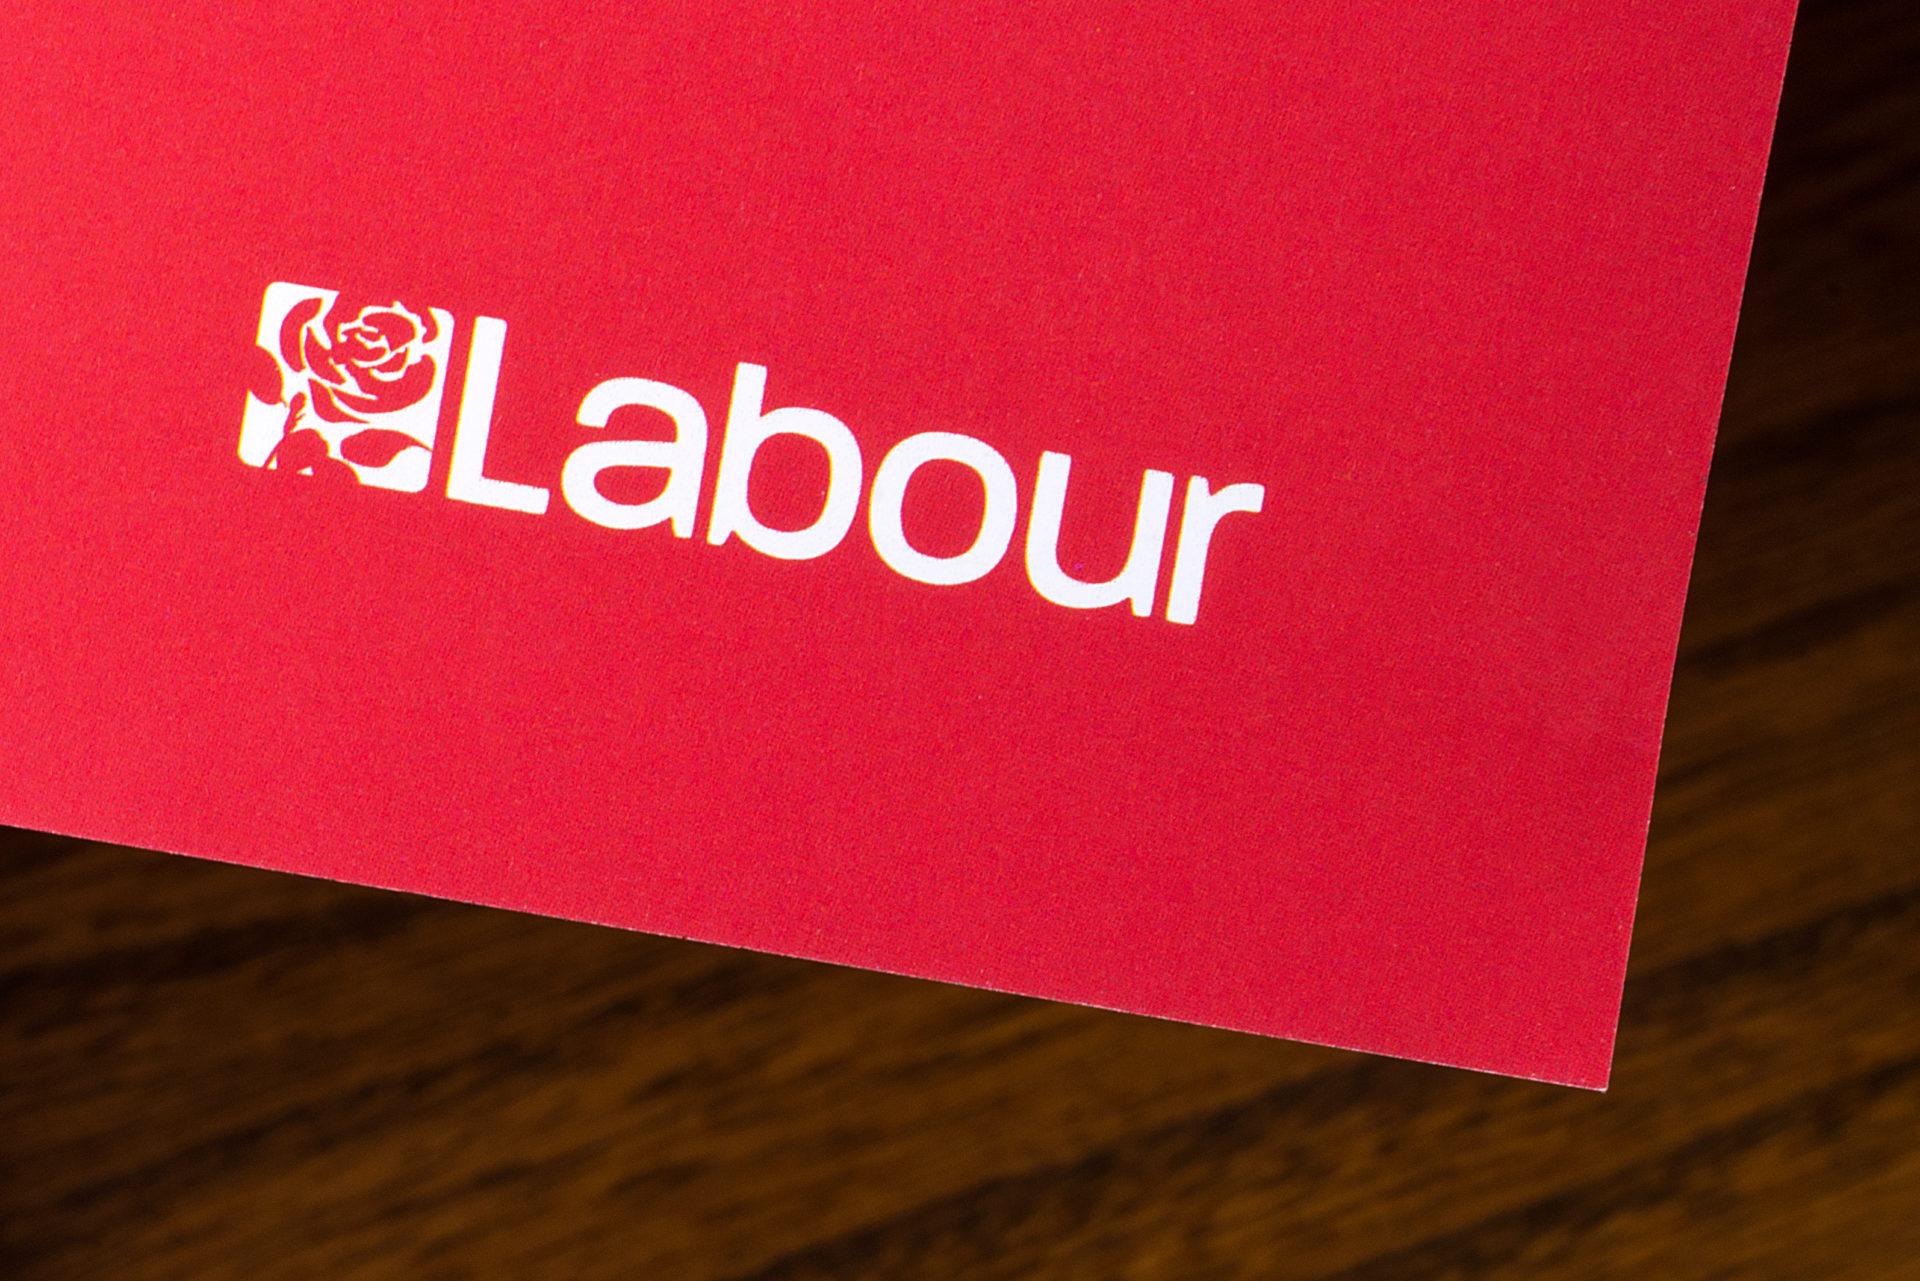 Ballot closes for Labour leadership contest / EU discusses Covid-19 medical gear logistics /ONS publishes UK economy coronavirus stats